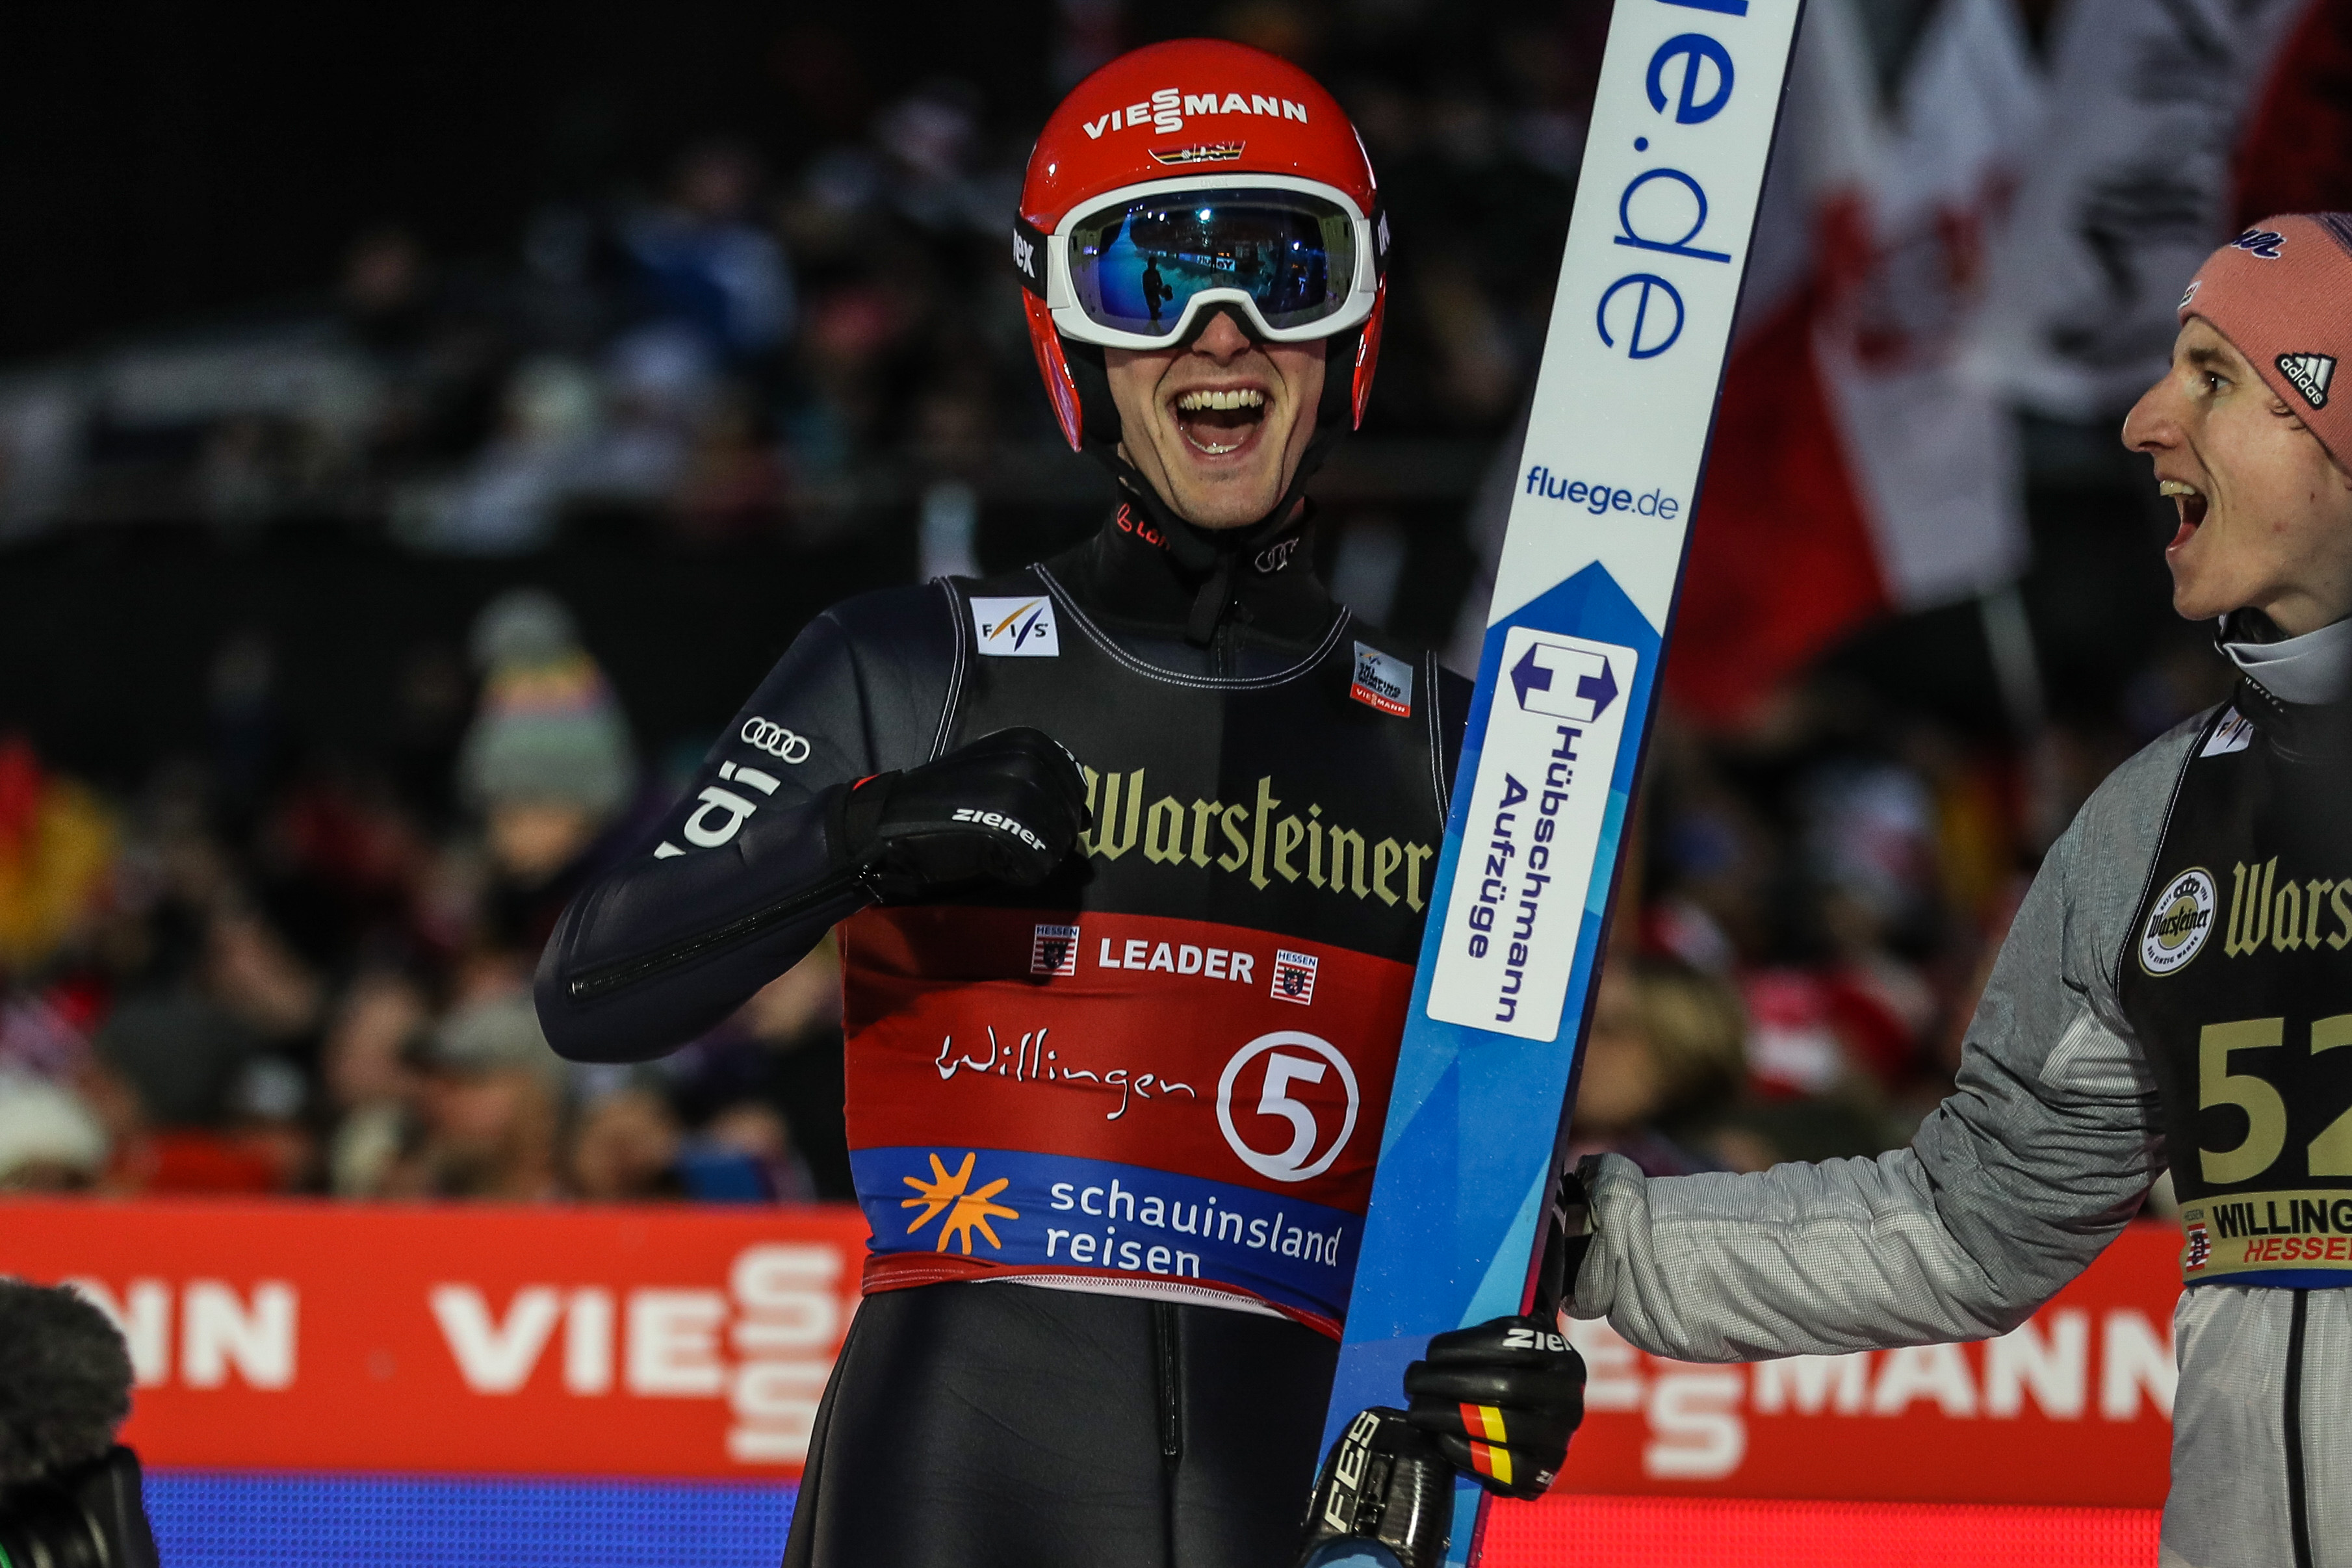 Skisprung Weltcup 2021